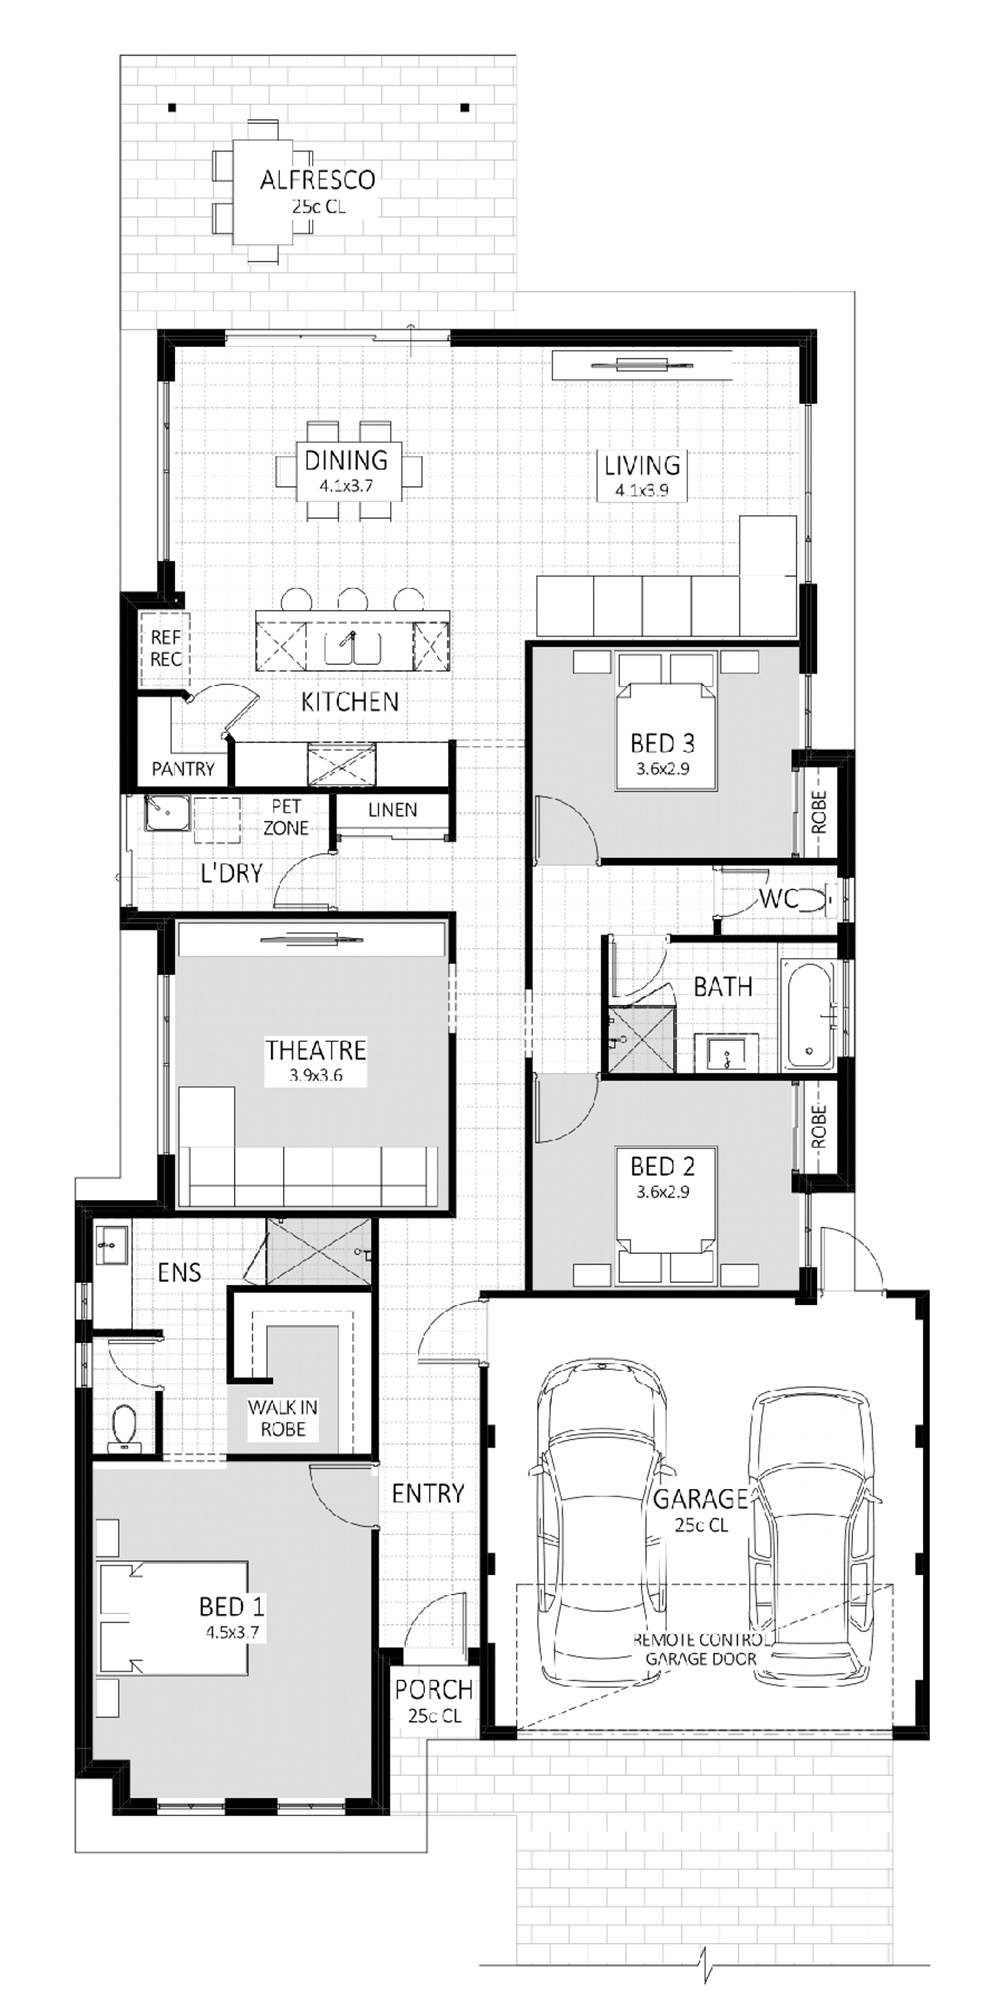 Vision floorplan